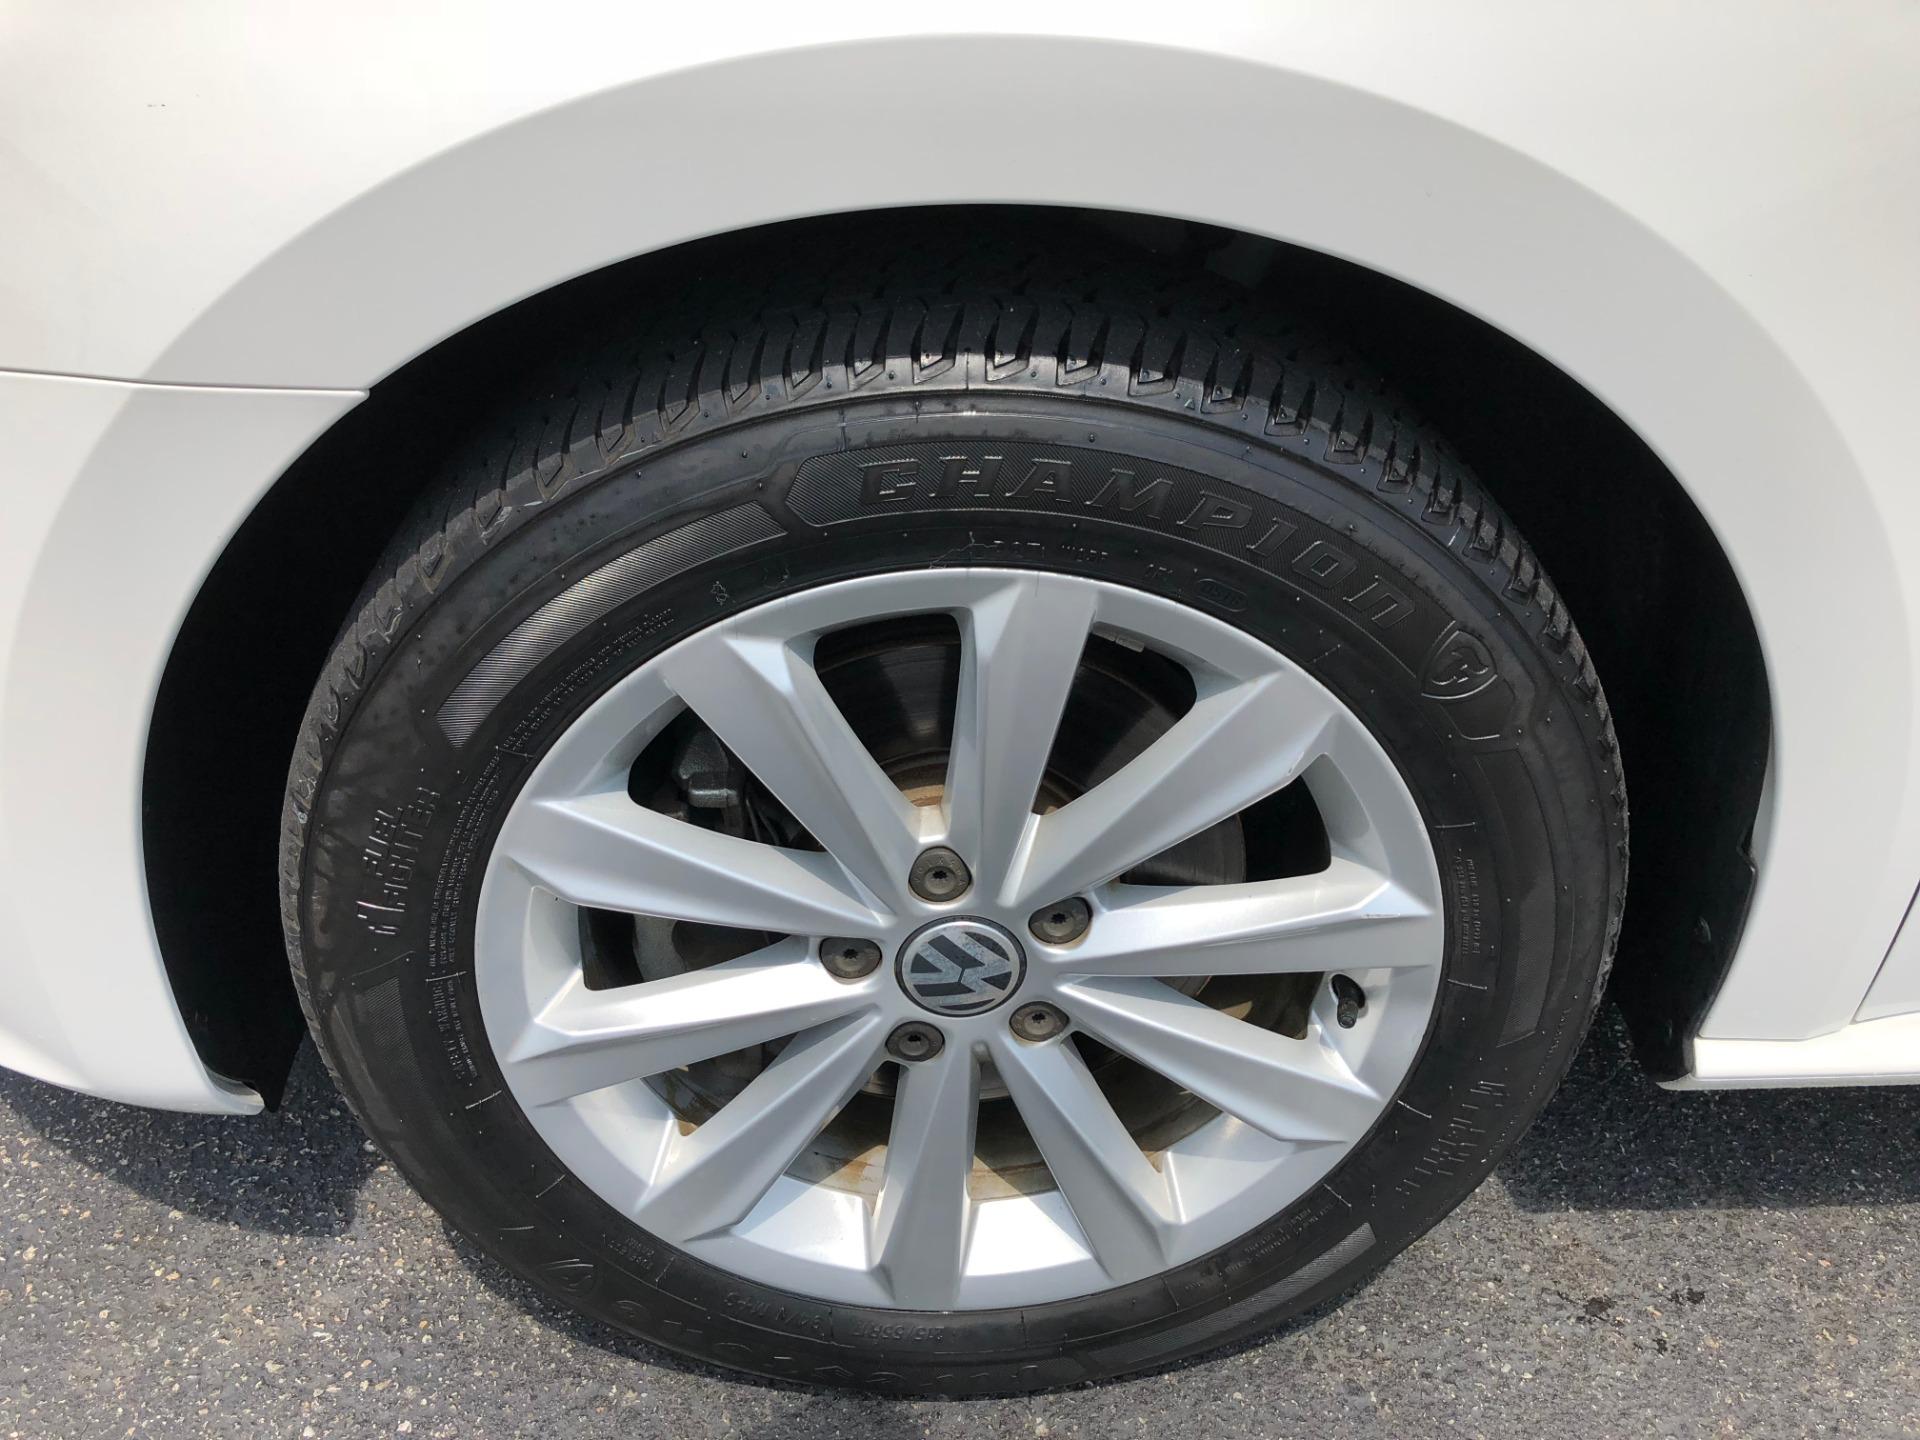 Used-2012-VOLKSWAGEN-PASSAT-SEL-SEL-Luxury-Cars-Lake-County